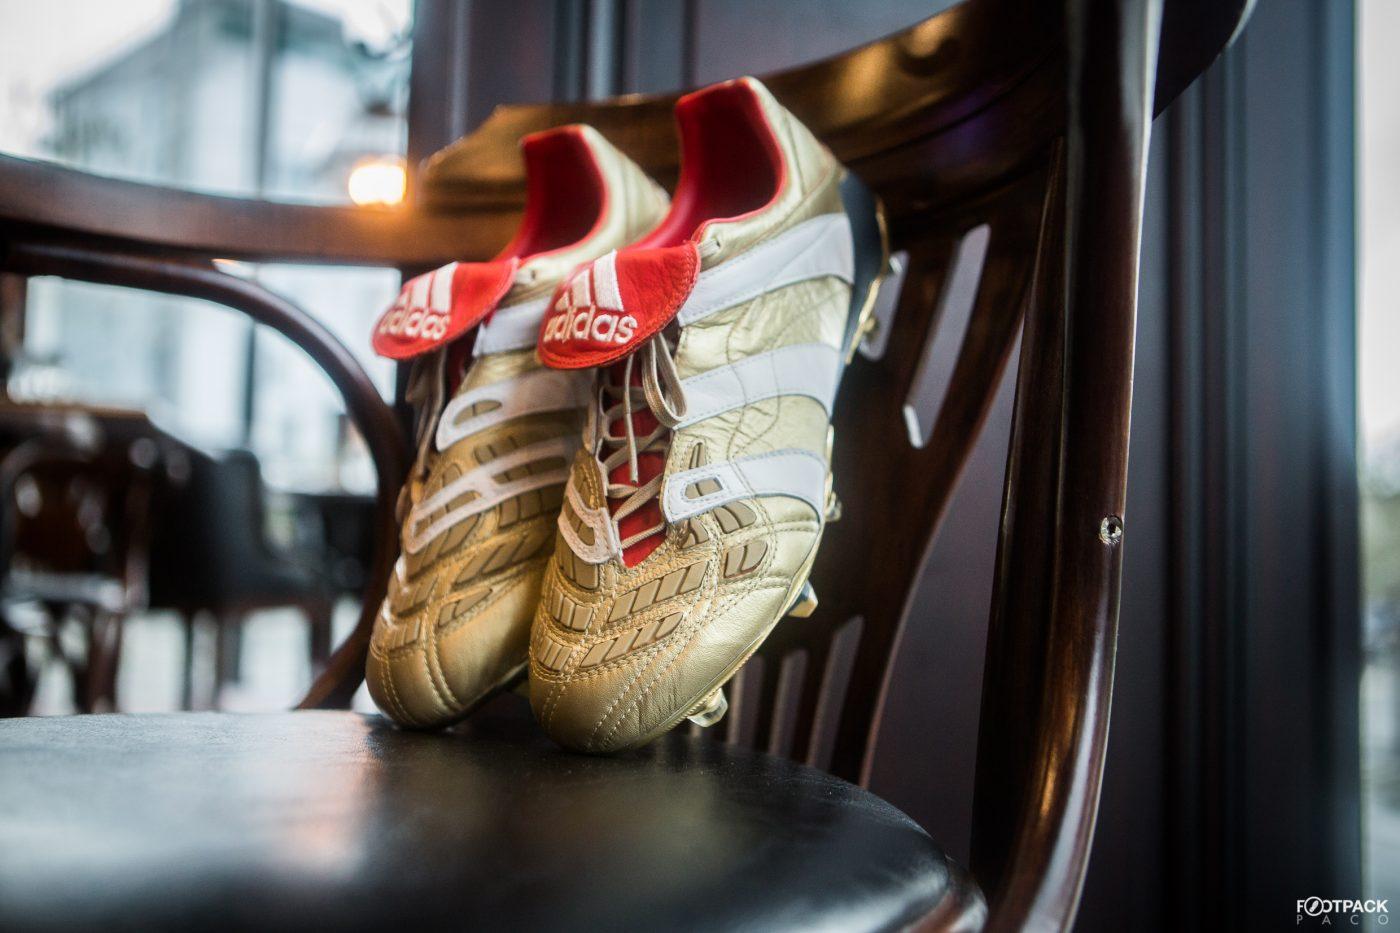 adidas-predator-accelerator-zinedine-zidane-collection-limitee-25-ans-predator-footpack-4